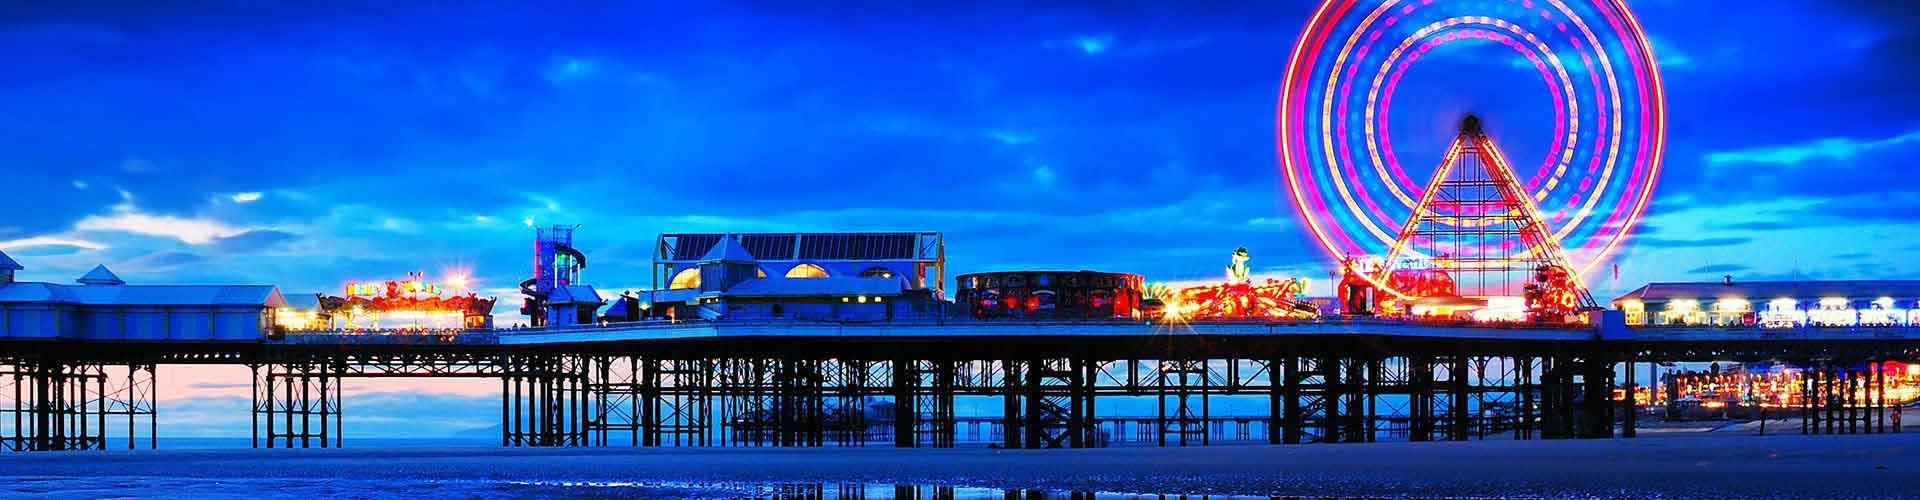 Blackpool – Hostellit kohteessa Blackpool. Blackpool -karttoja, valokuvia ja arvosteluja kaikista Blackpool -hostelleista.